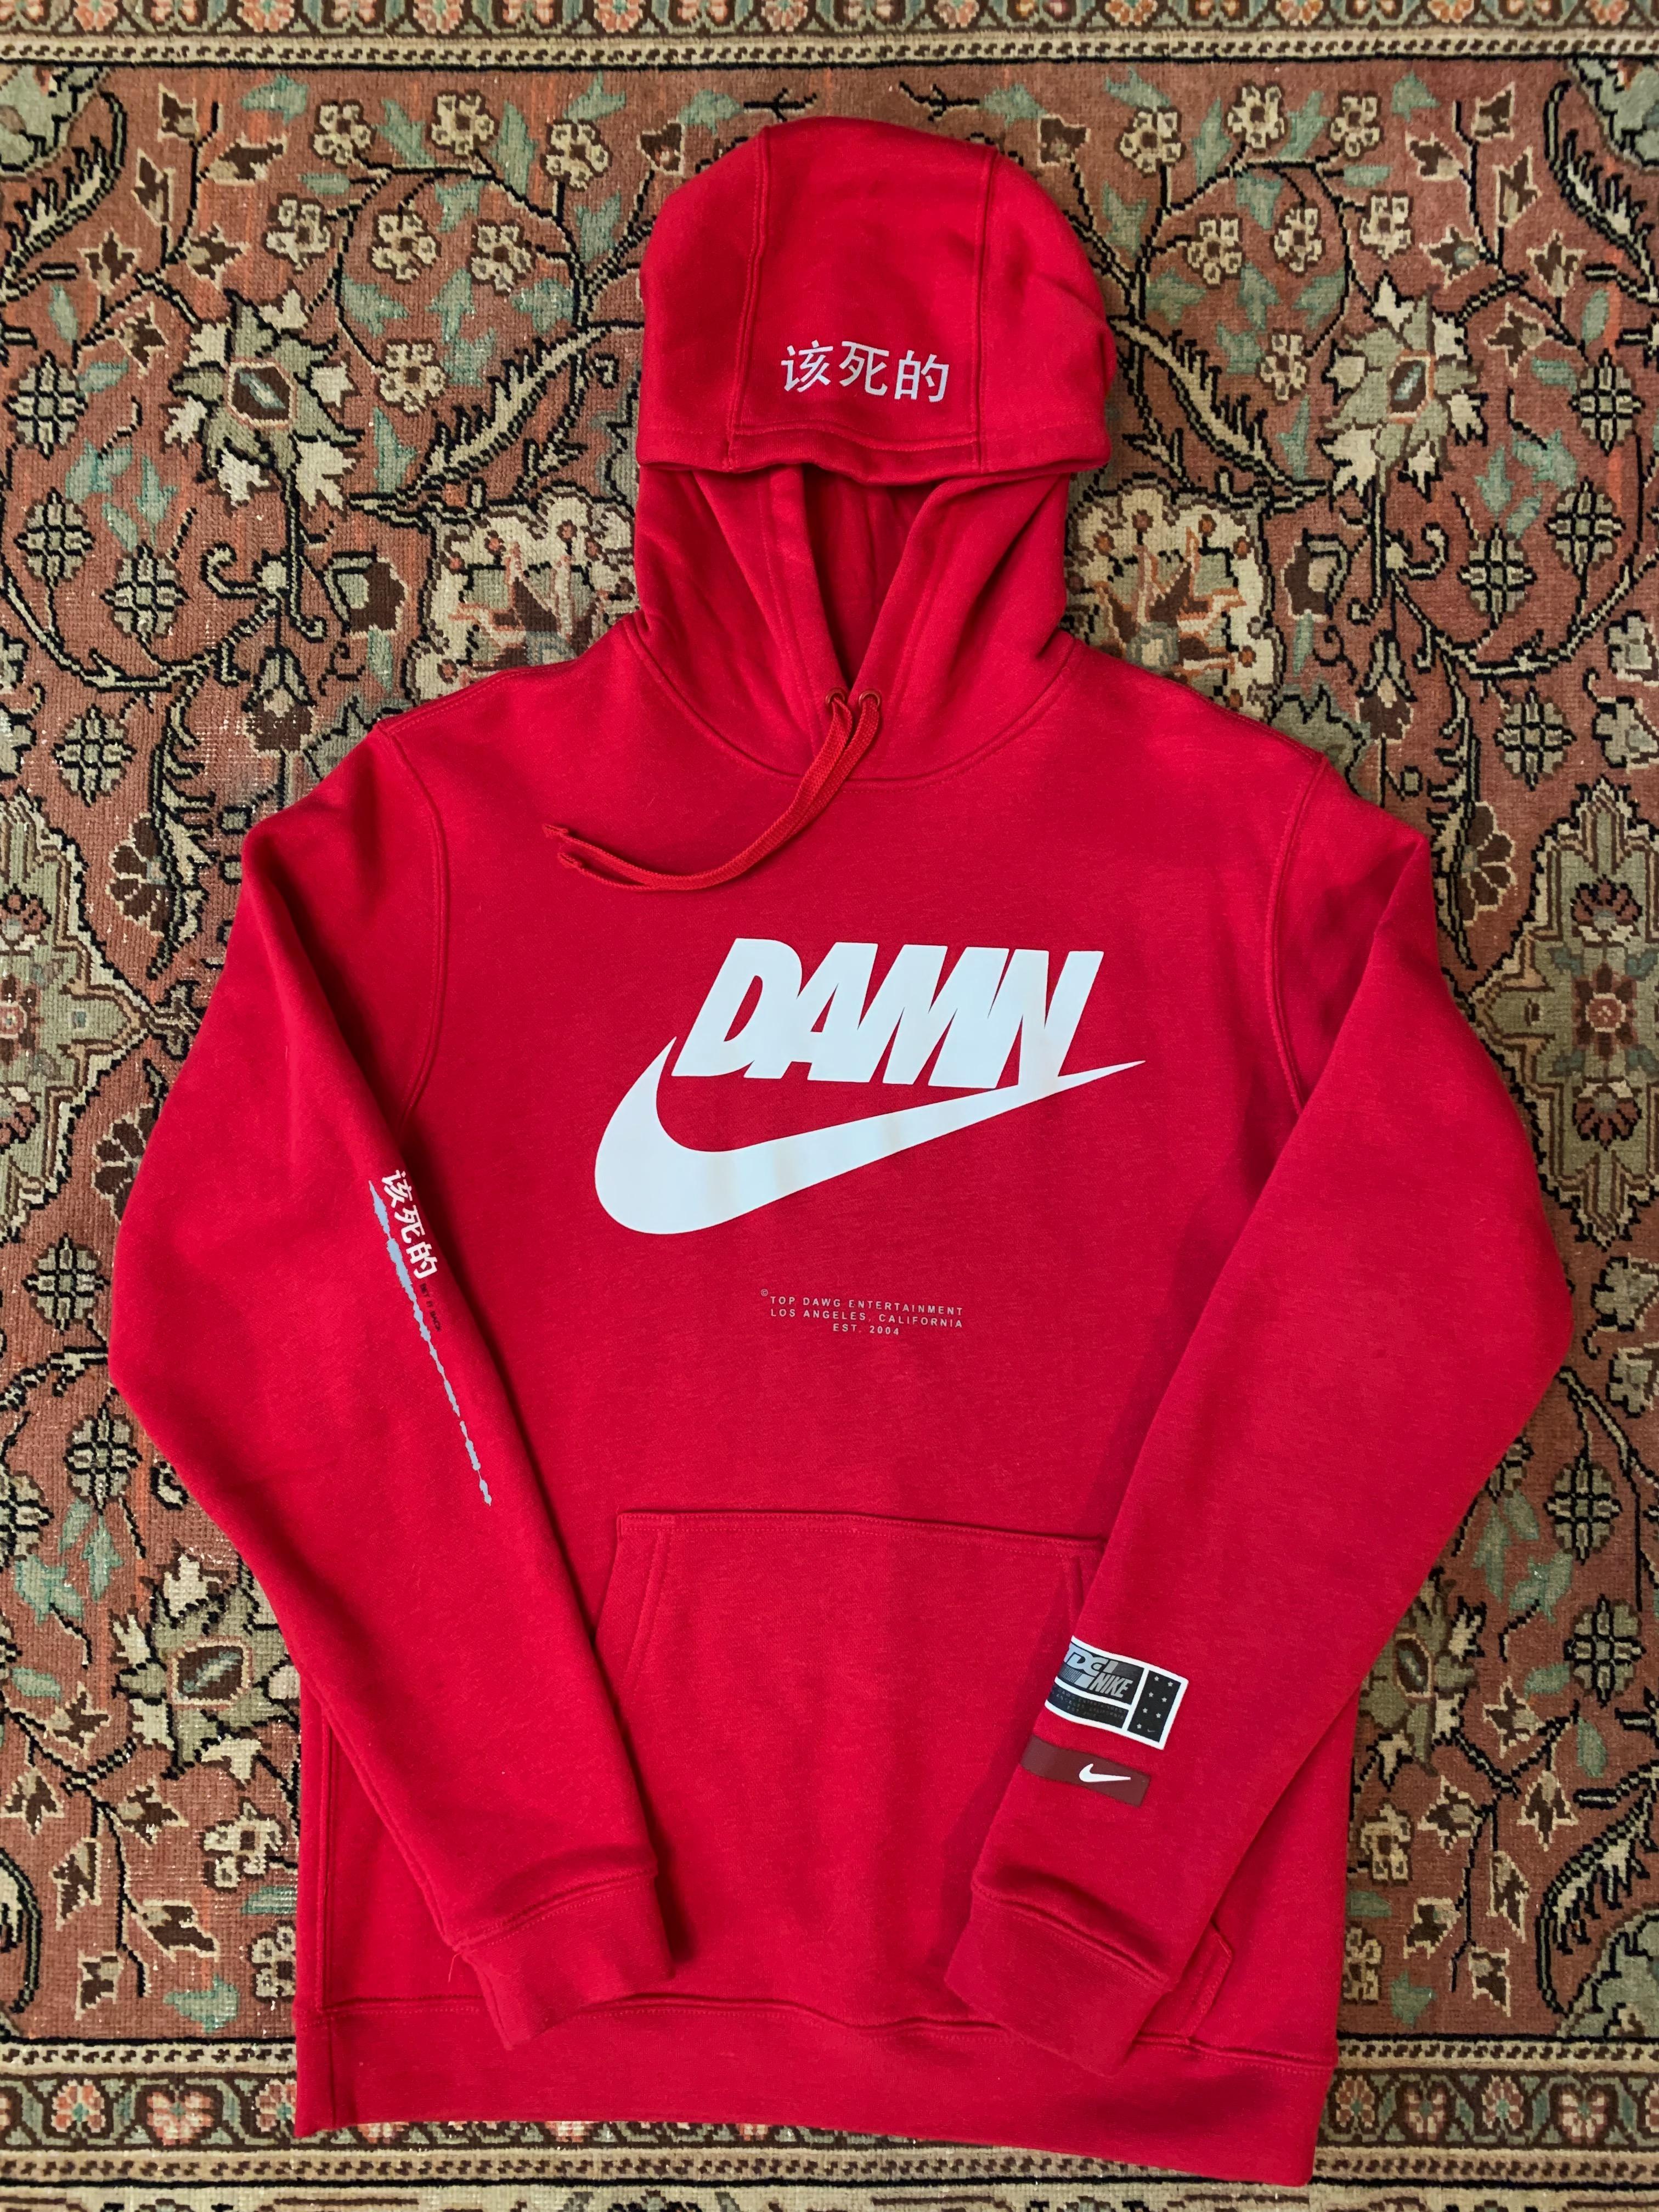 Disparates Ya pobreza  Nike Nike X Tde X Kendrick Lamar Damn Hoodie M Red | Grailed